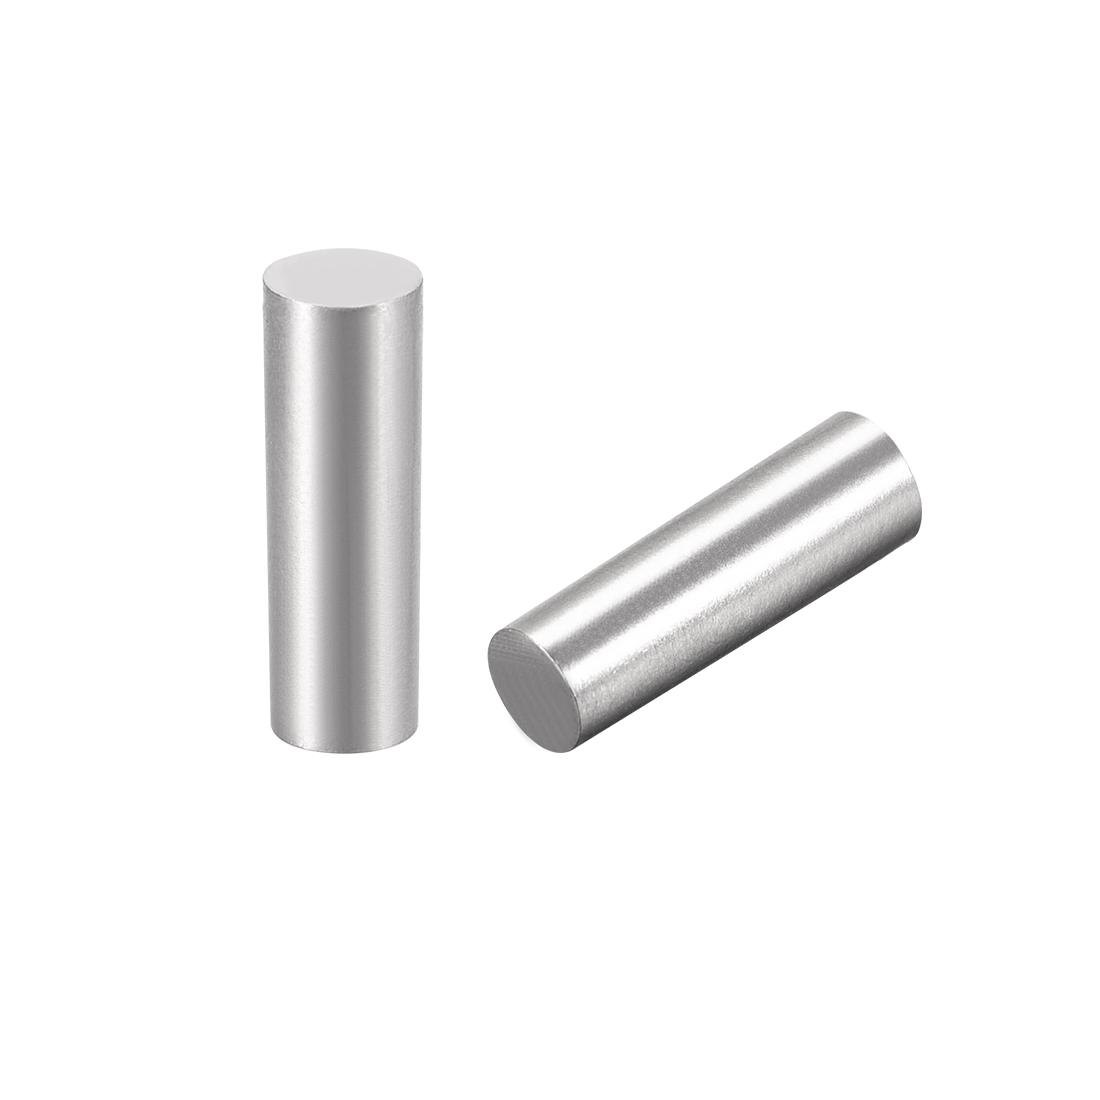 2Pcs 4mm x 16mm 1:50 Taper Pin 304 Stainless Steel Shelf Support Pin Fasten